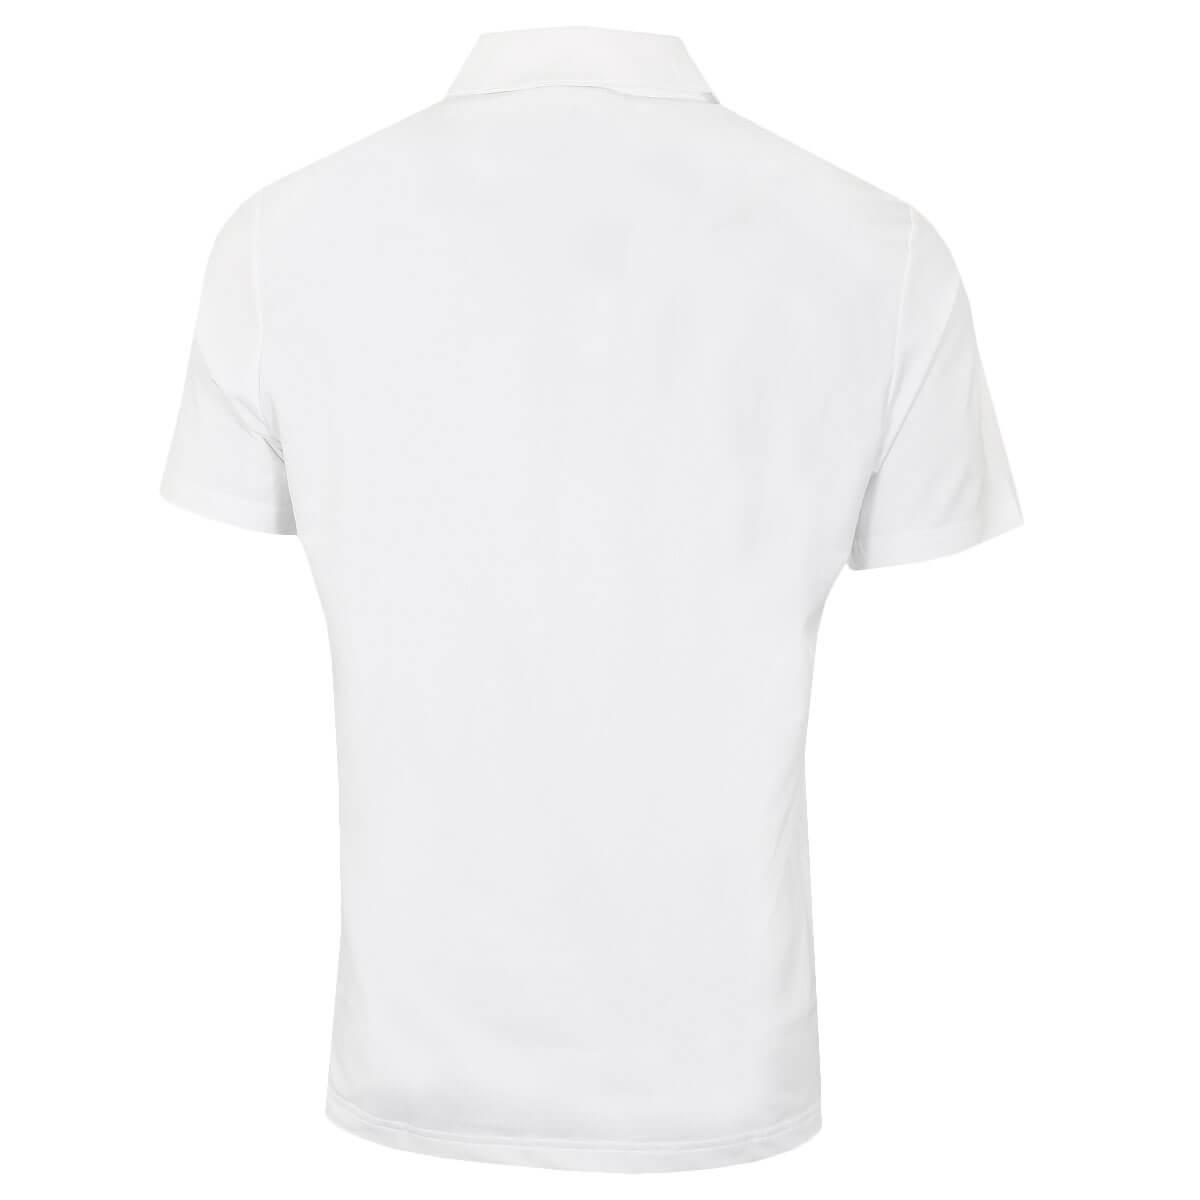 Adidas-Golf-Men-039-s-Ultimate-2-0-Solid-Crestable-Polo-Shirt thumbnail 31